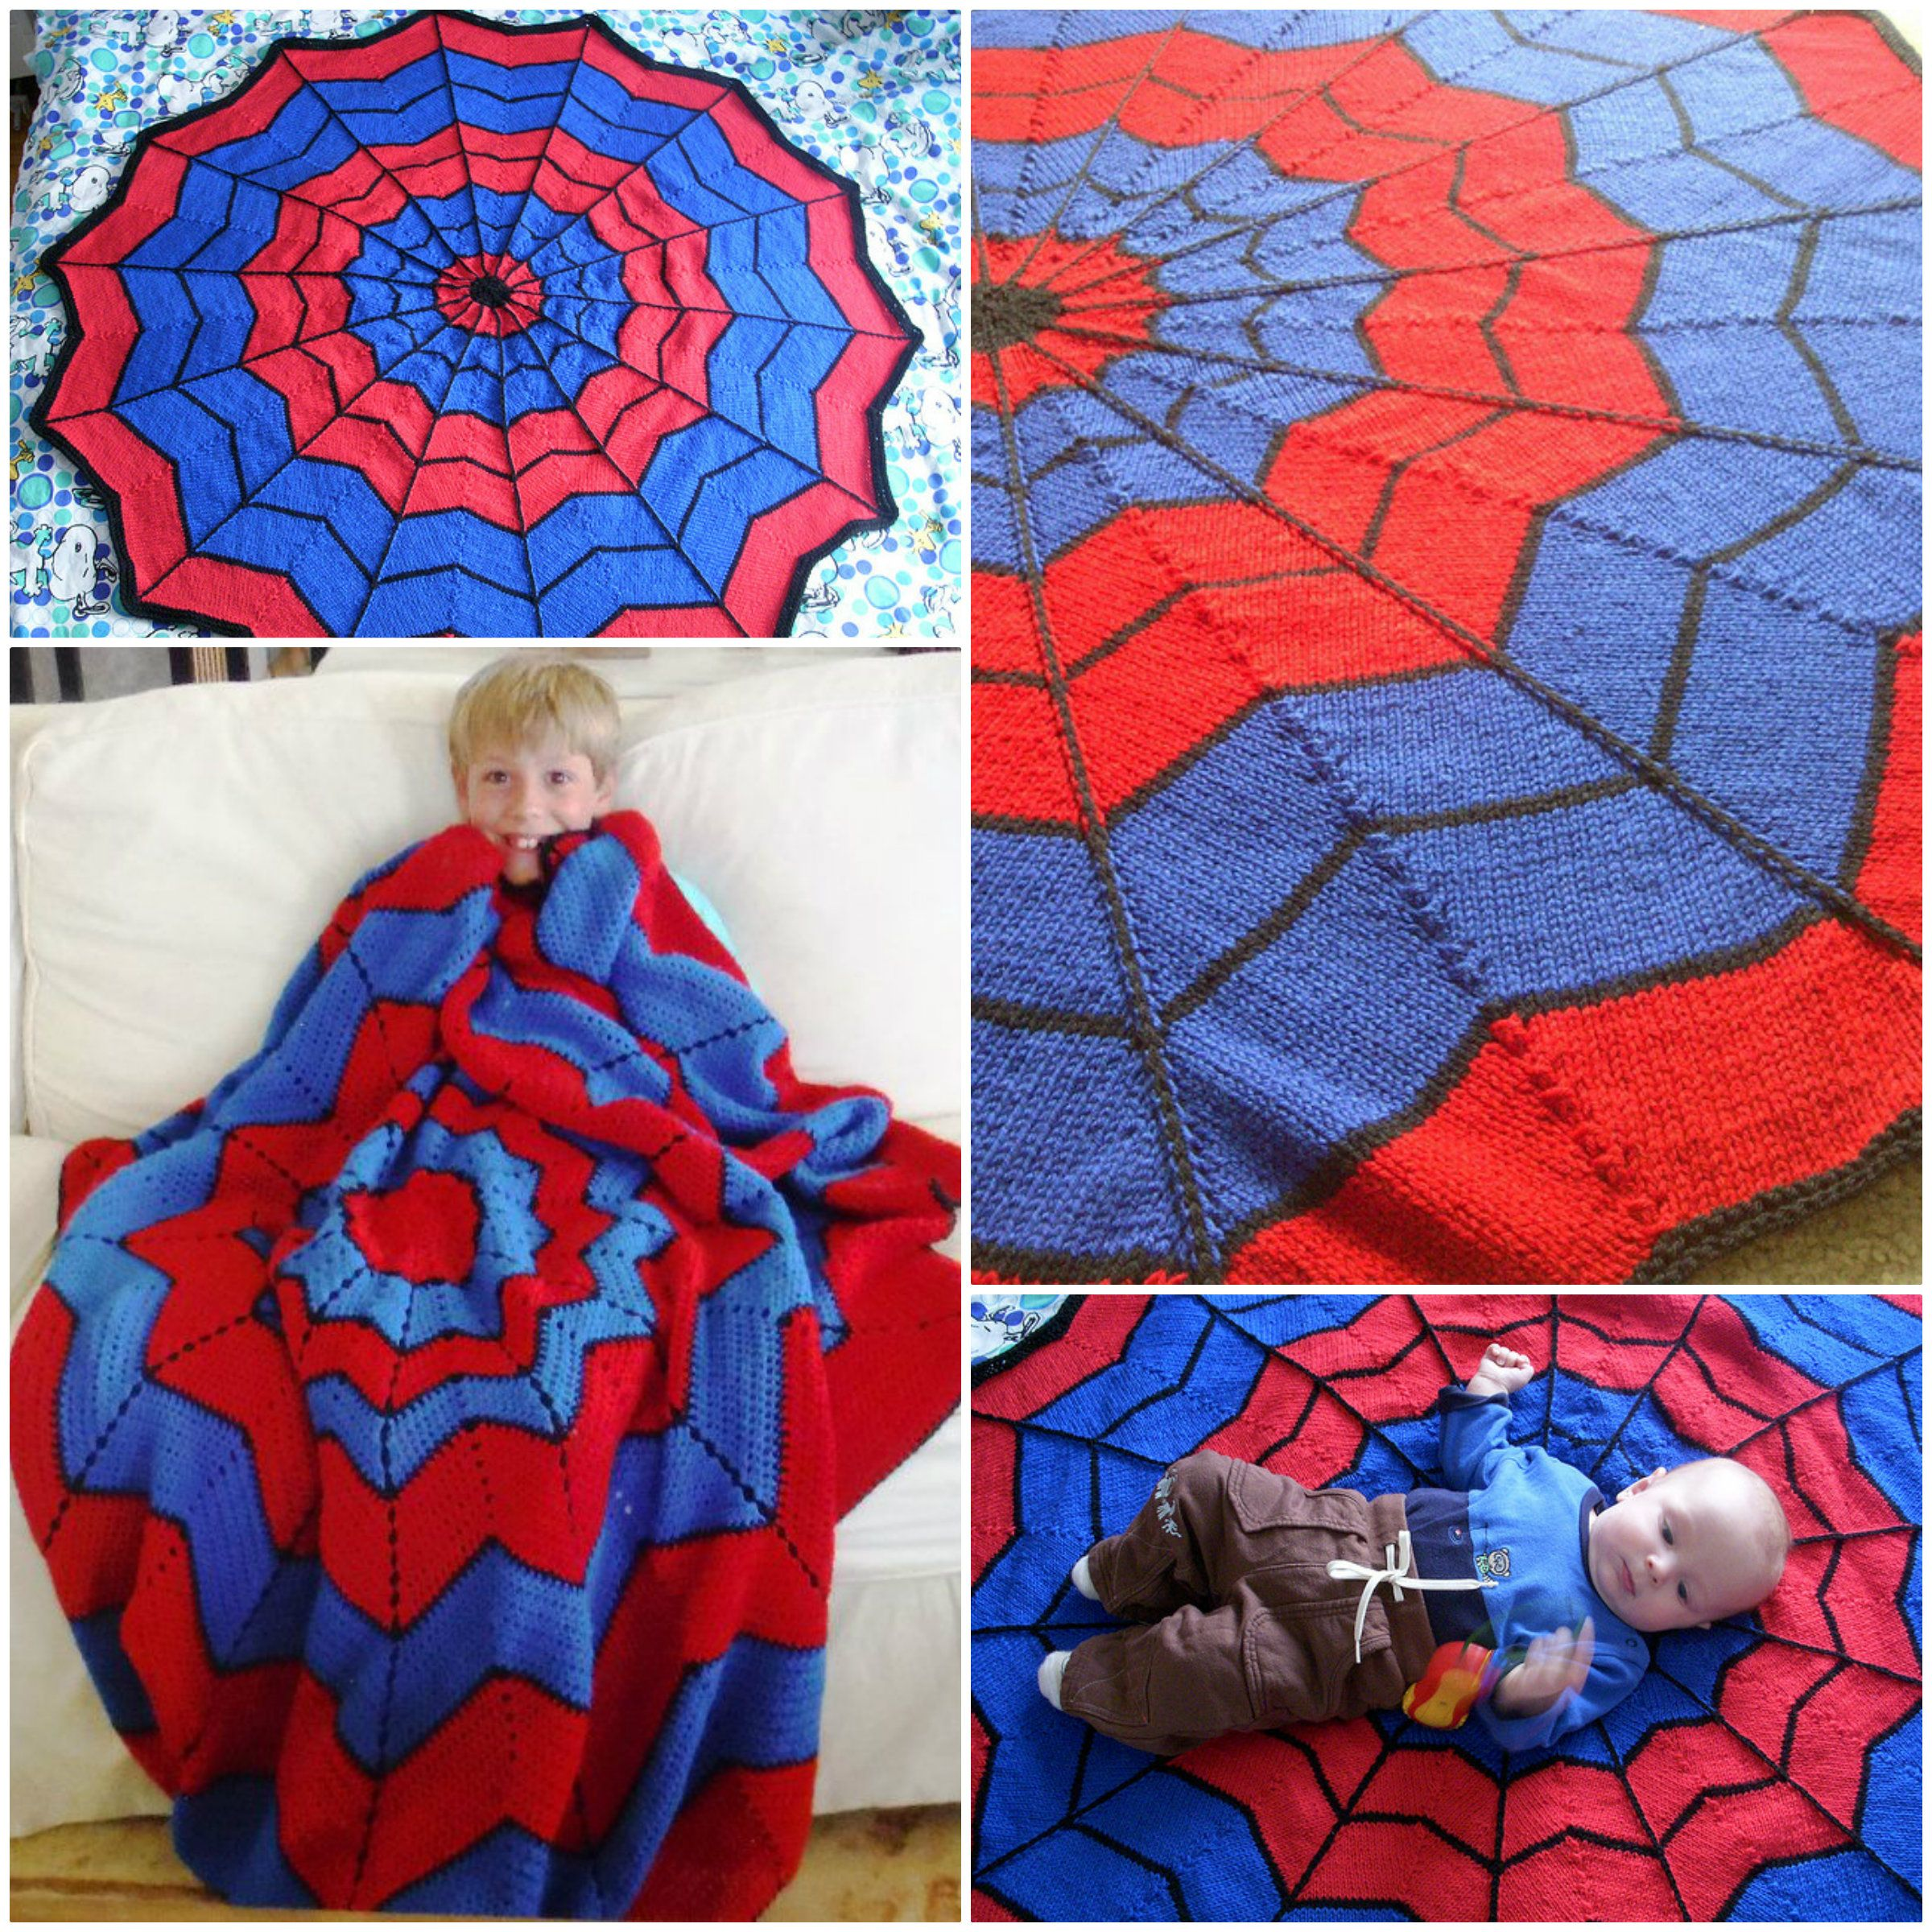 Spiderman Knitted Blanket Free Pattern | Spiderman blanket ...